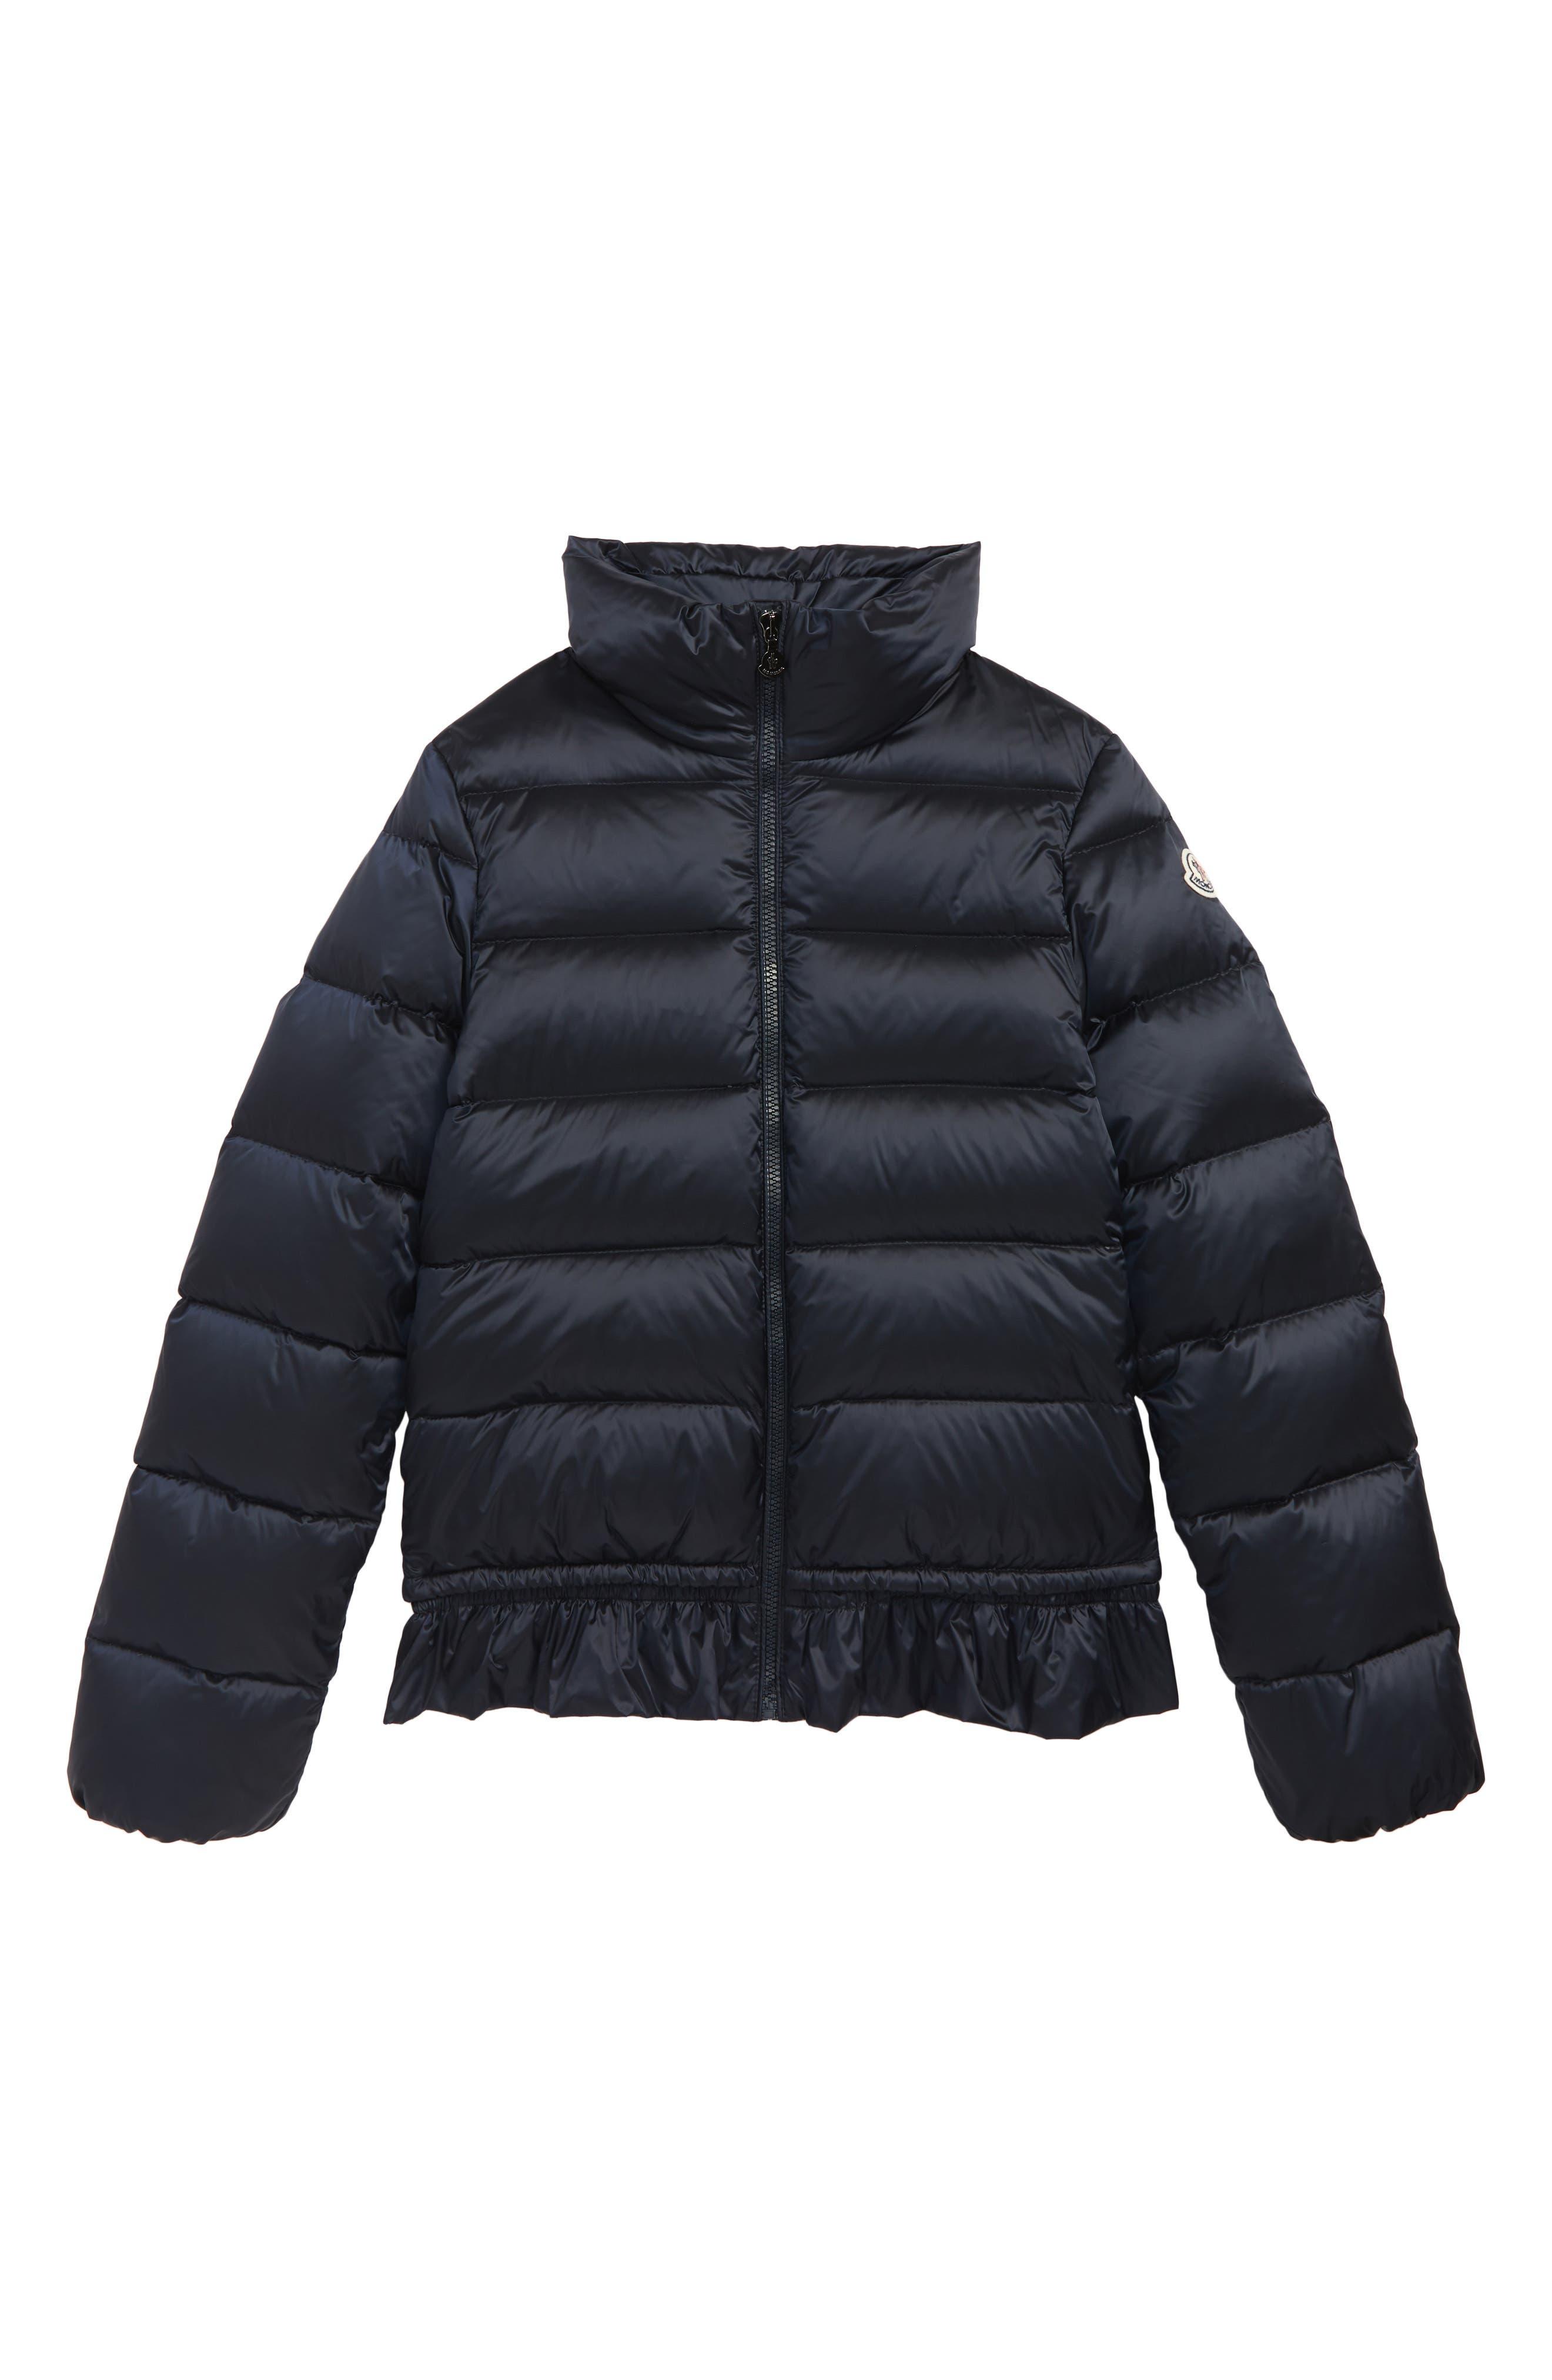 MONCLER Anemonet Ruffle Trim Jacket, Main, color, NAVY